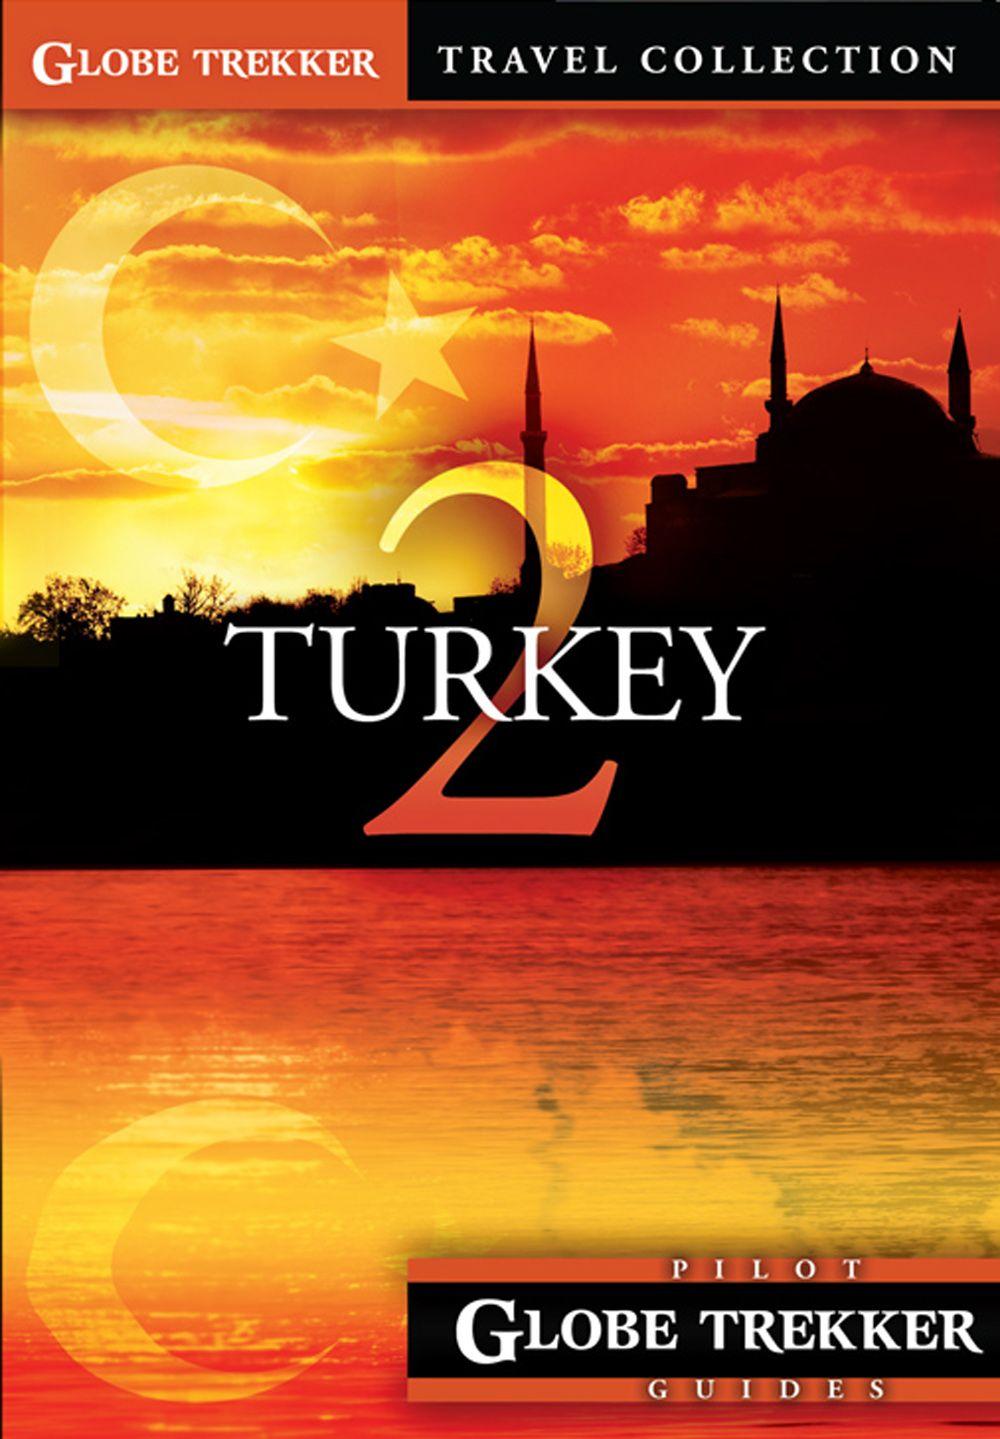 Globe Trekker: Turkey 2